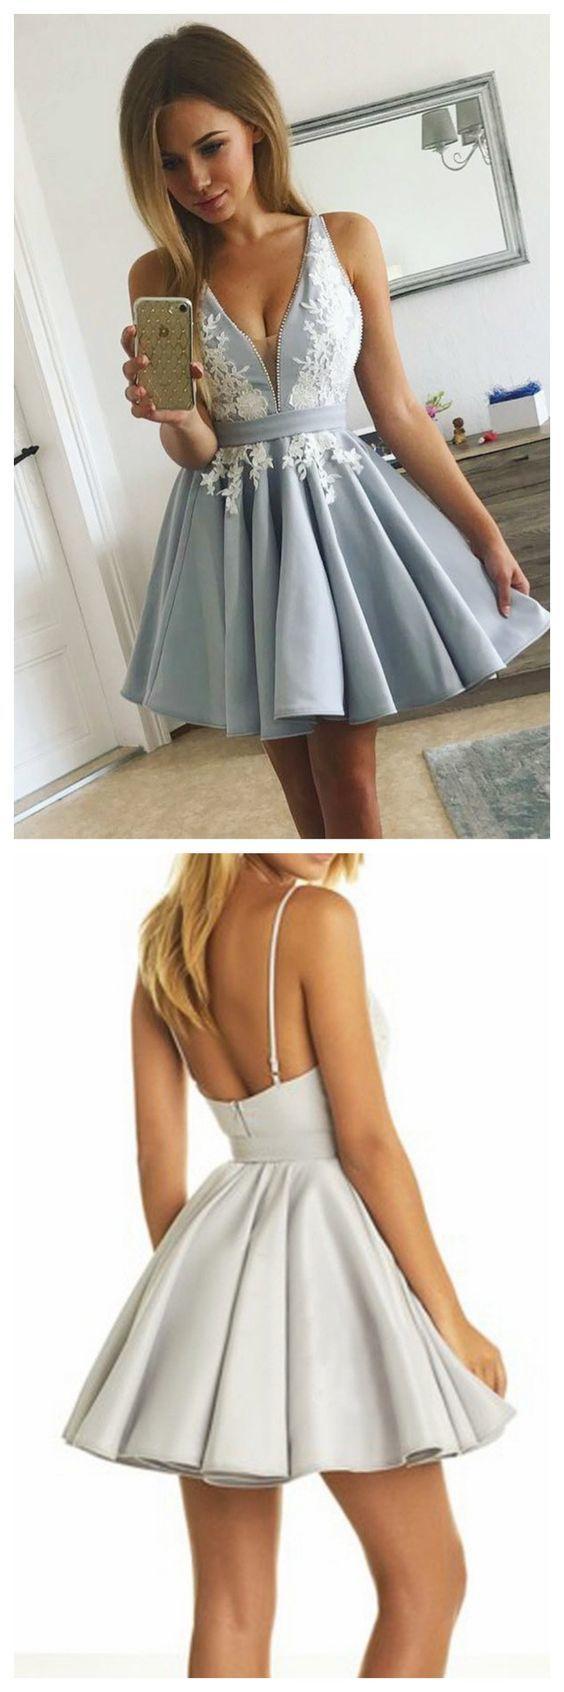 Silver Homecoming Dresses,Satin Homecoming Dresses,Lace Homecoming Dresses,